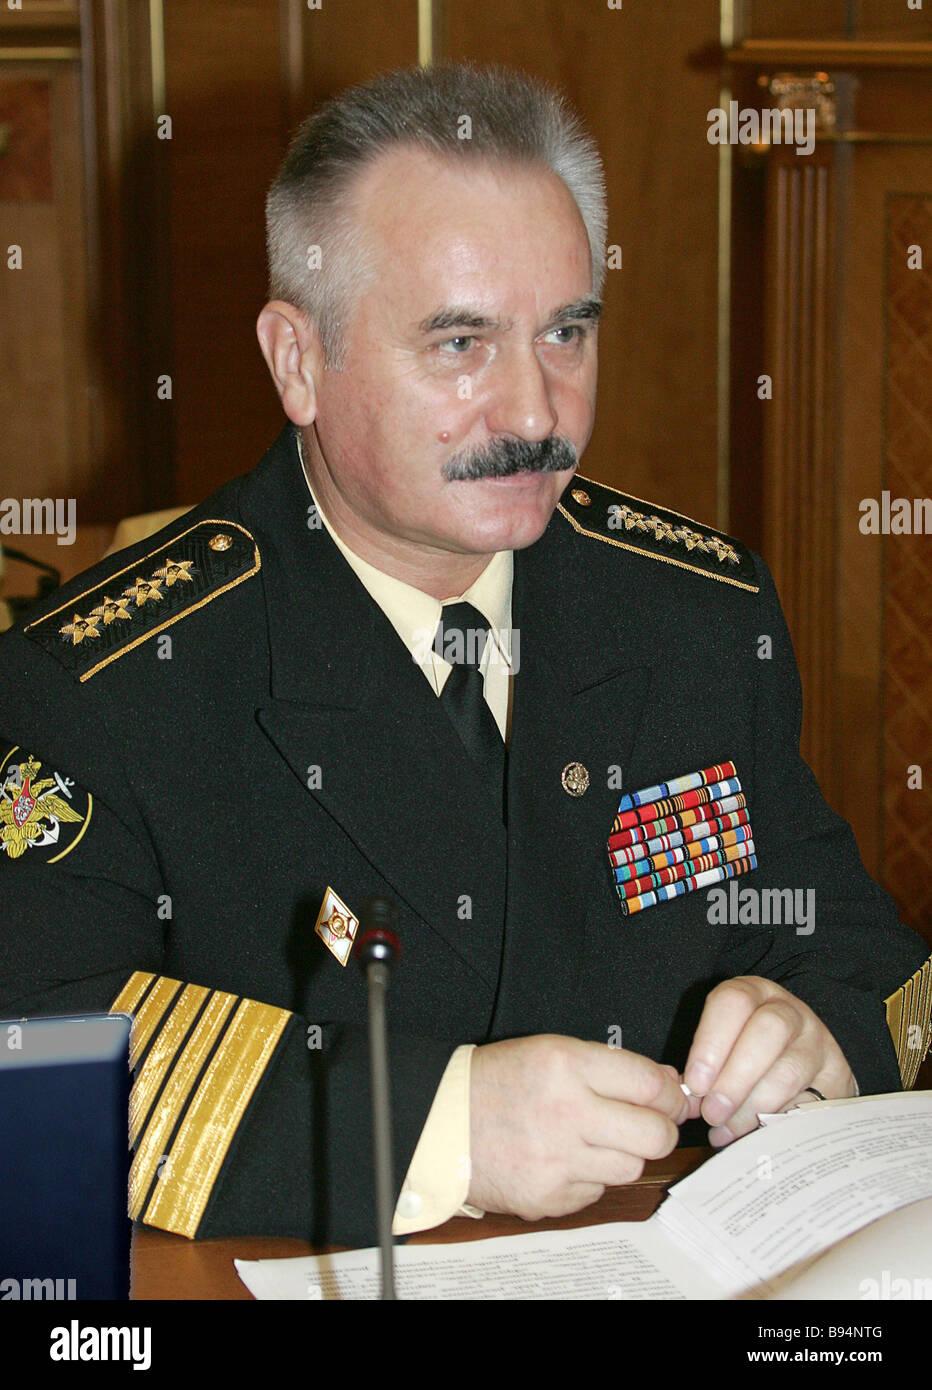 Fleet Admiral Vladimir Masorin Commander In Chief Of The Russian Navy Attends Maritime Collegium Session At